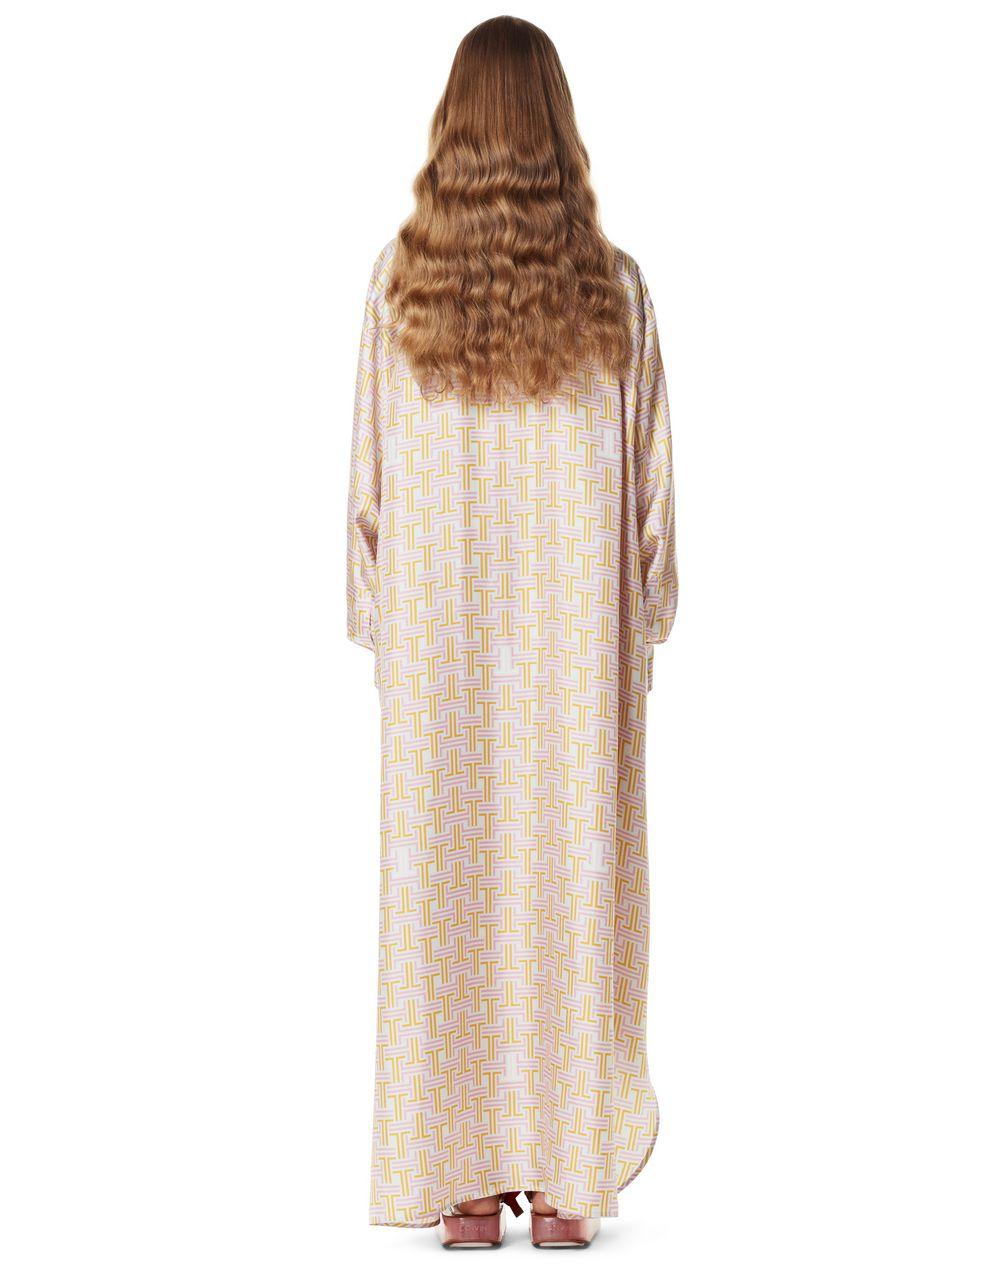 THE MAZE PRINT LONG SHIRT DRESS - Lanvin